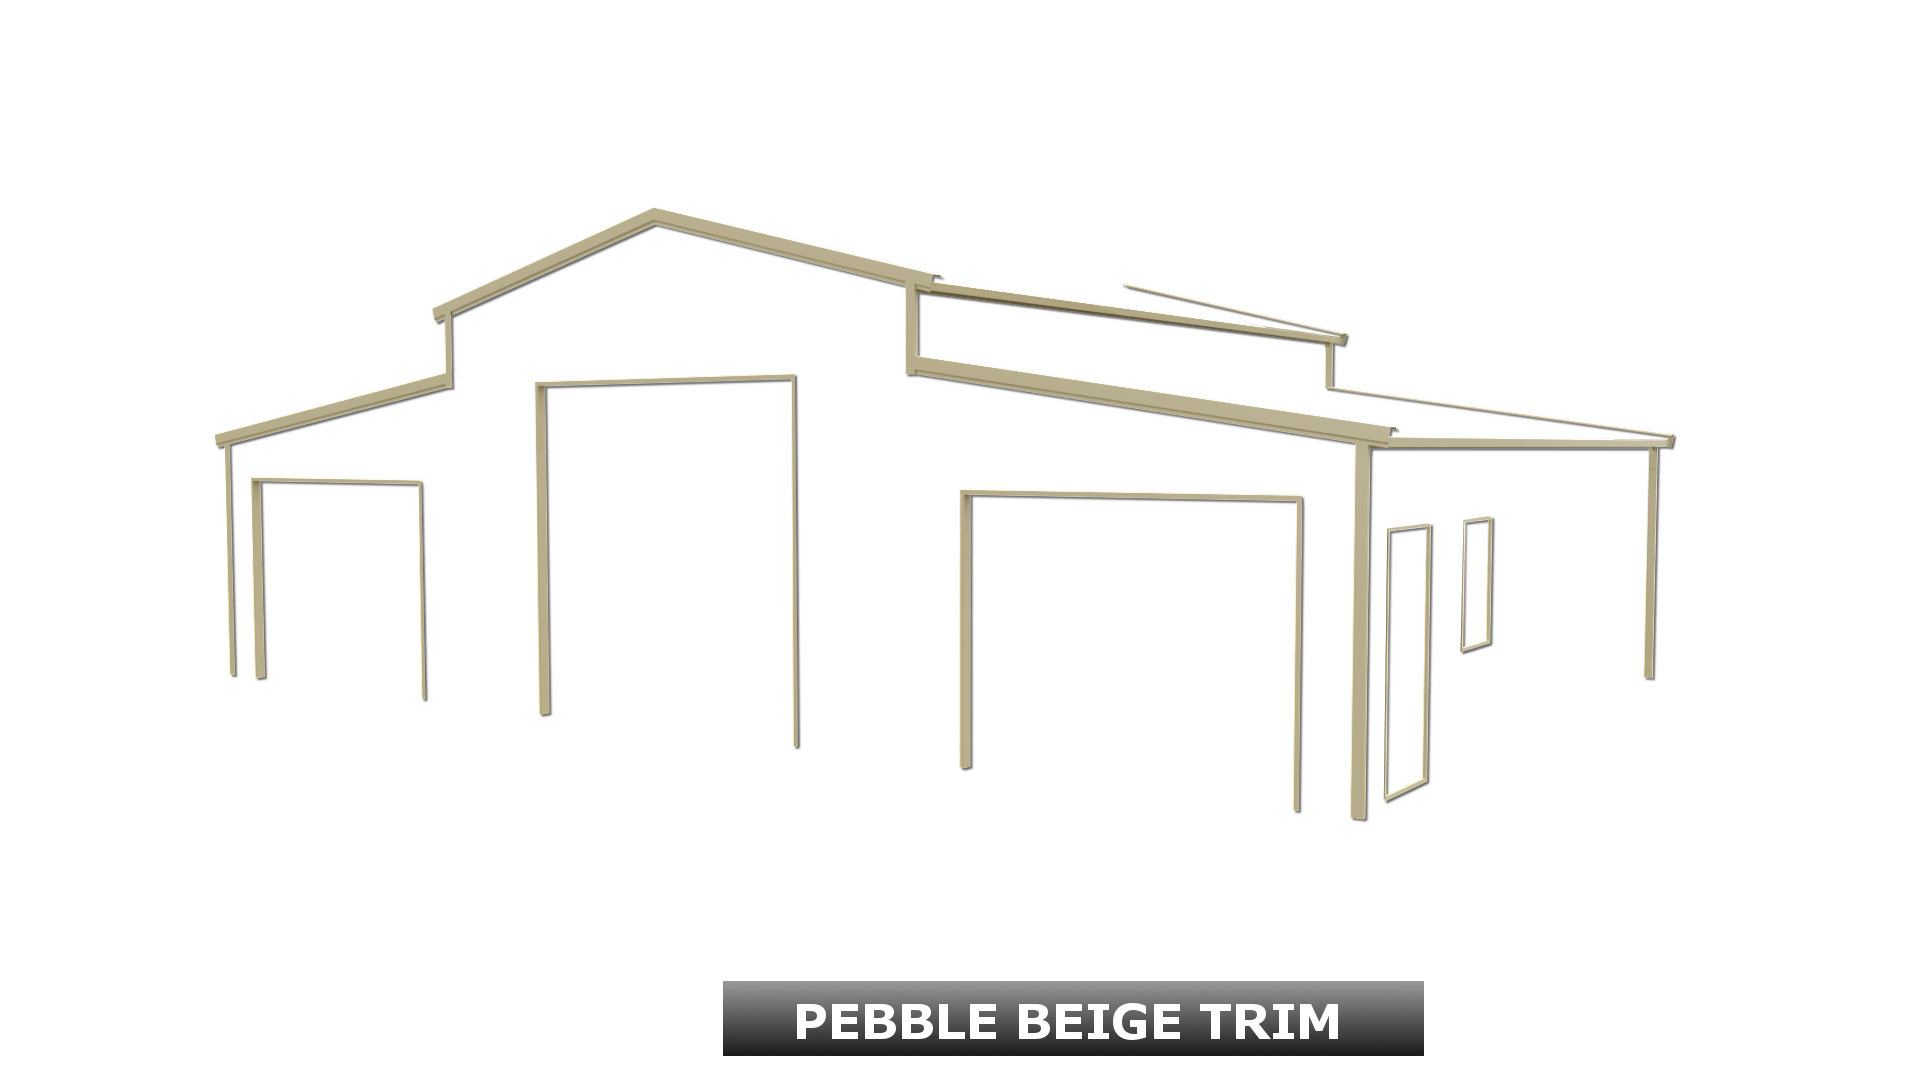 PEBBLE BEIGE TRIM